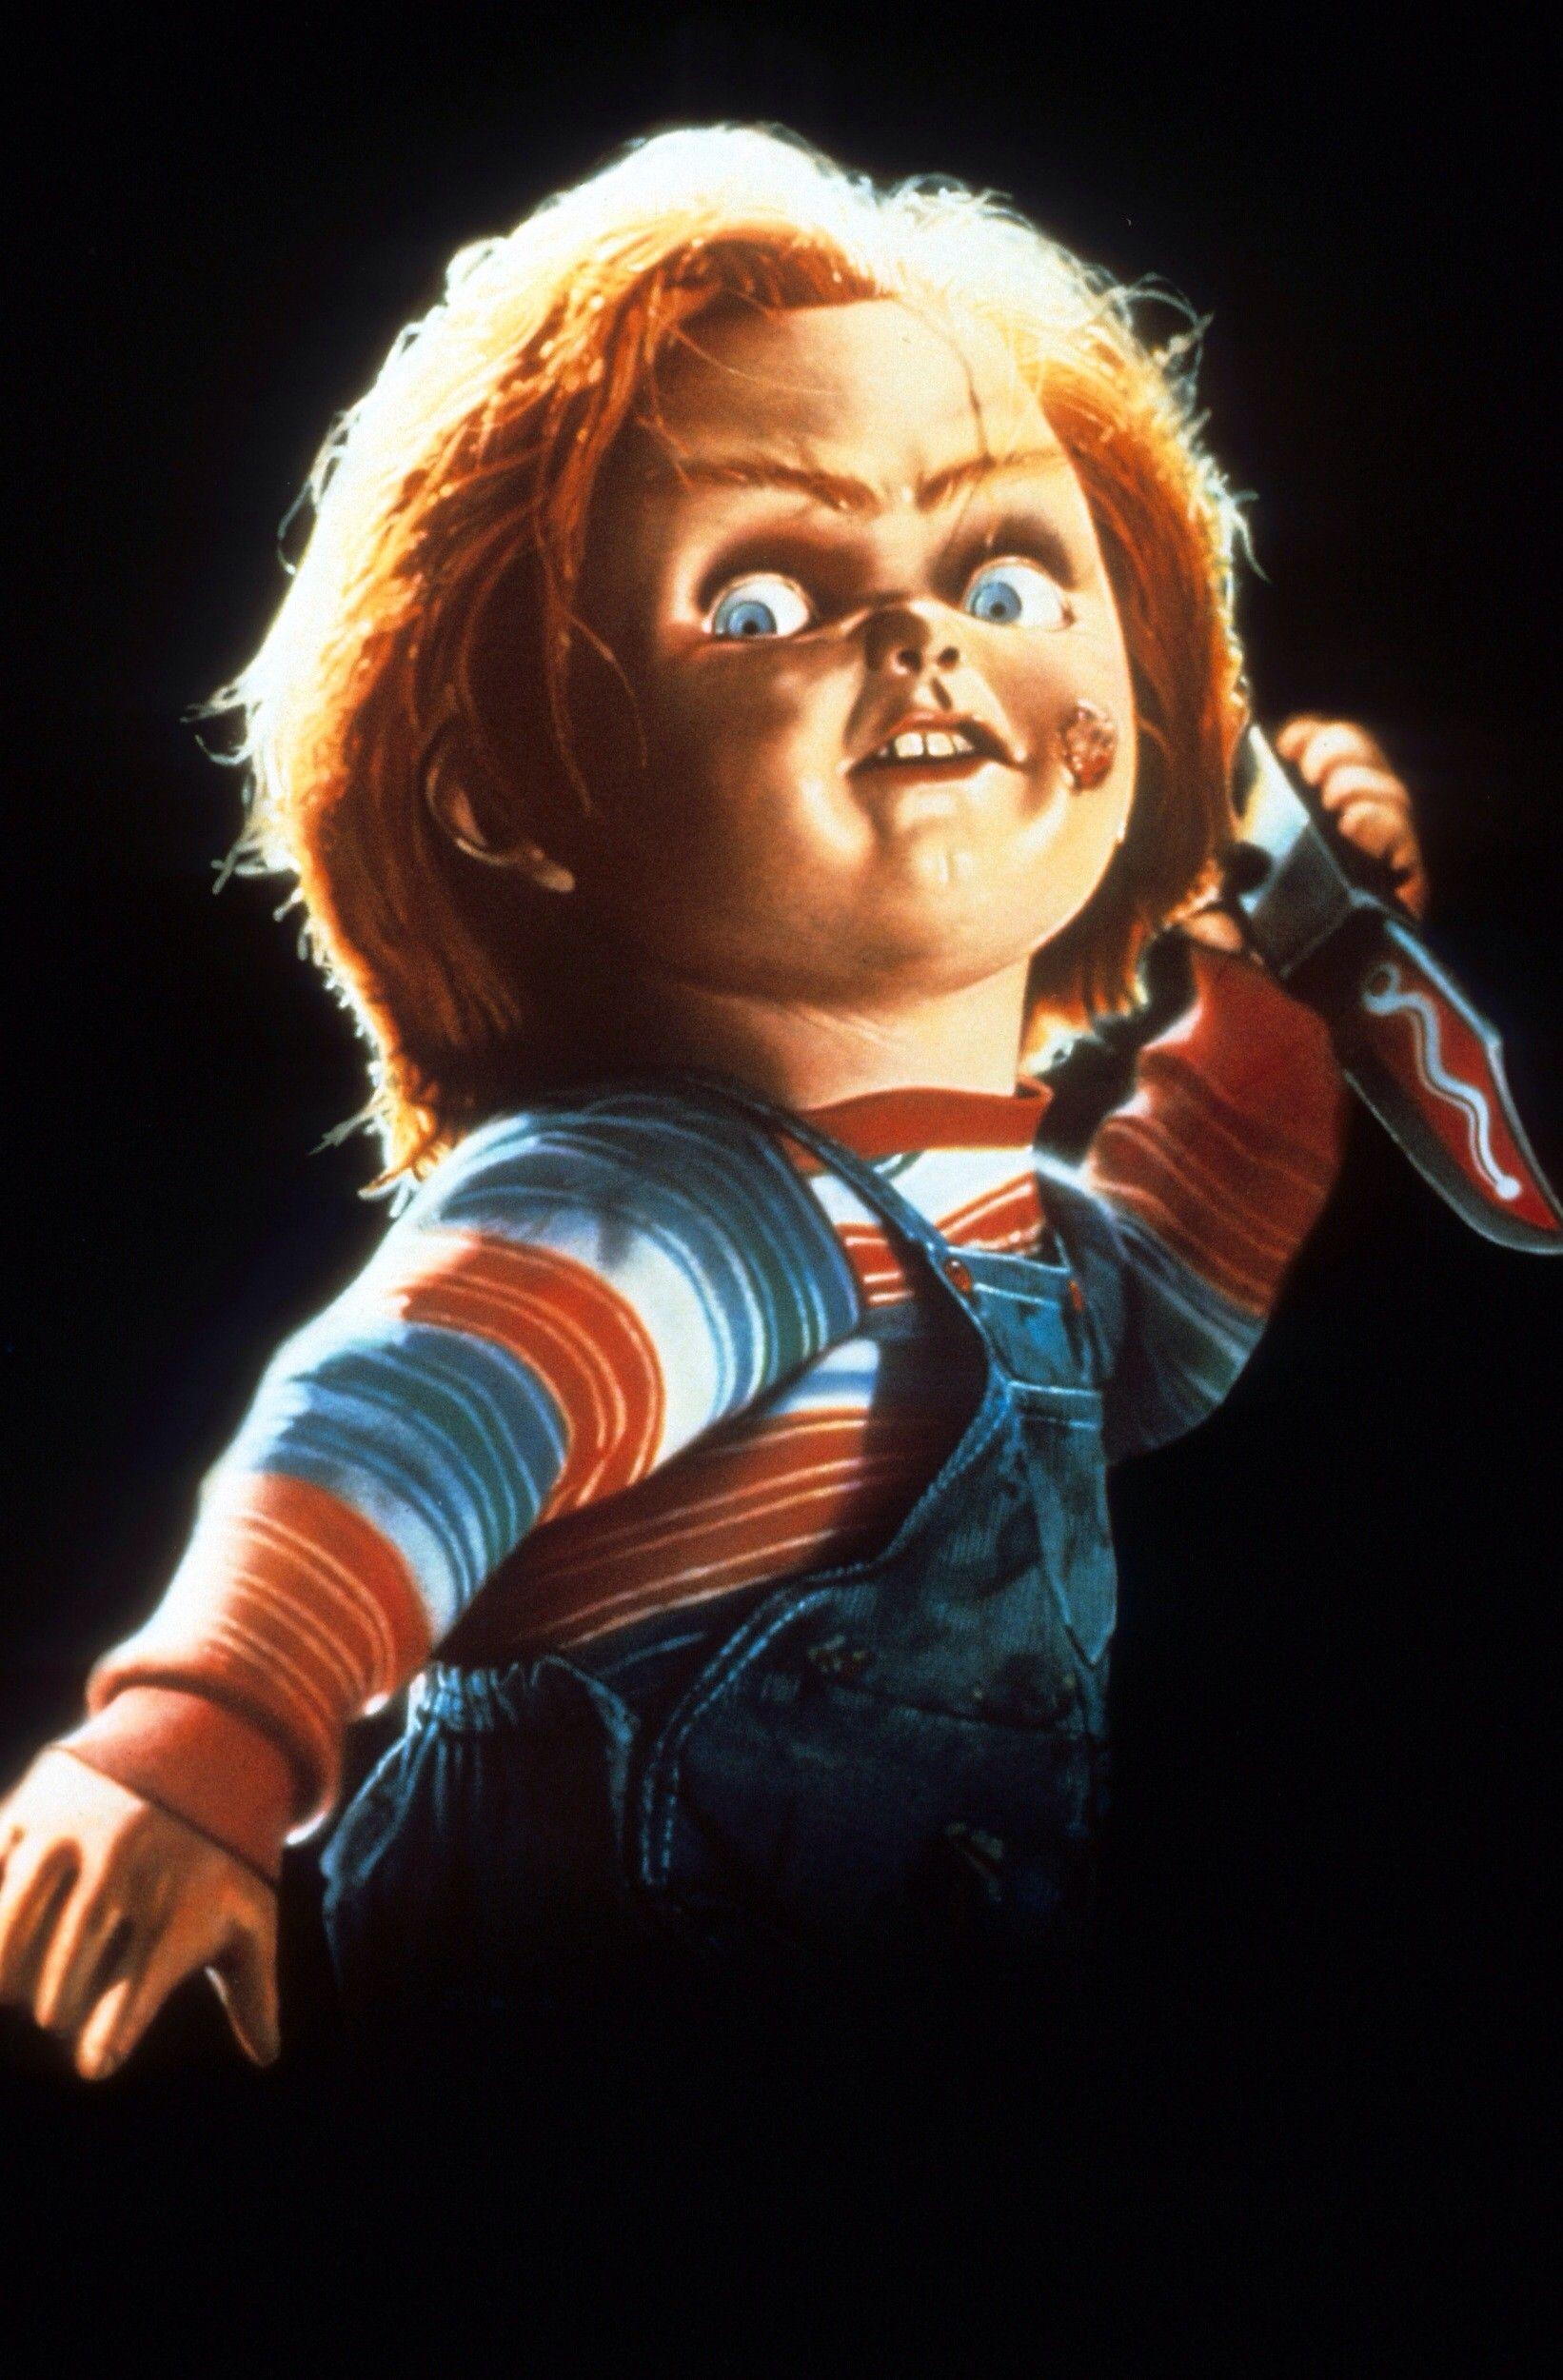 Best Halloween Movies, Childs Play Chucky